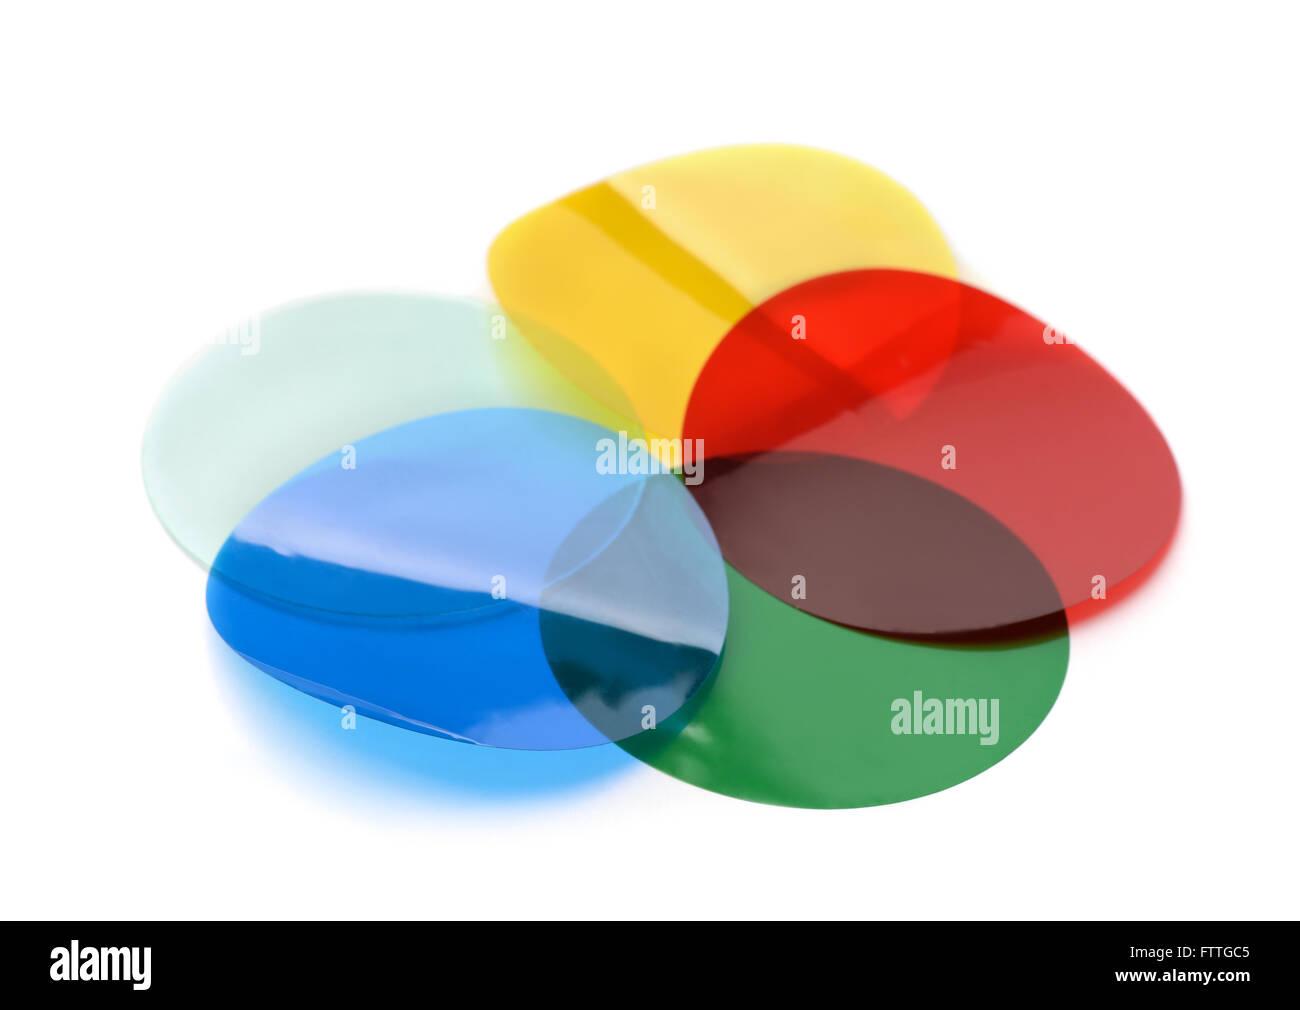 lighting gels stock photos lighting gels stock images alamy